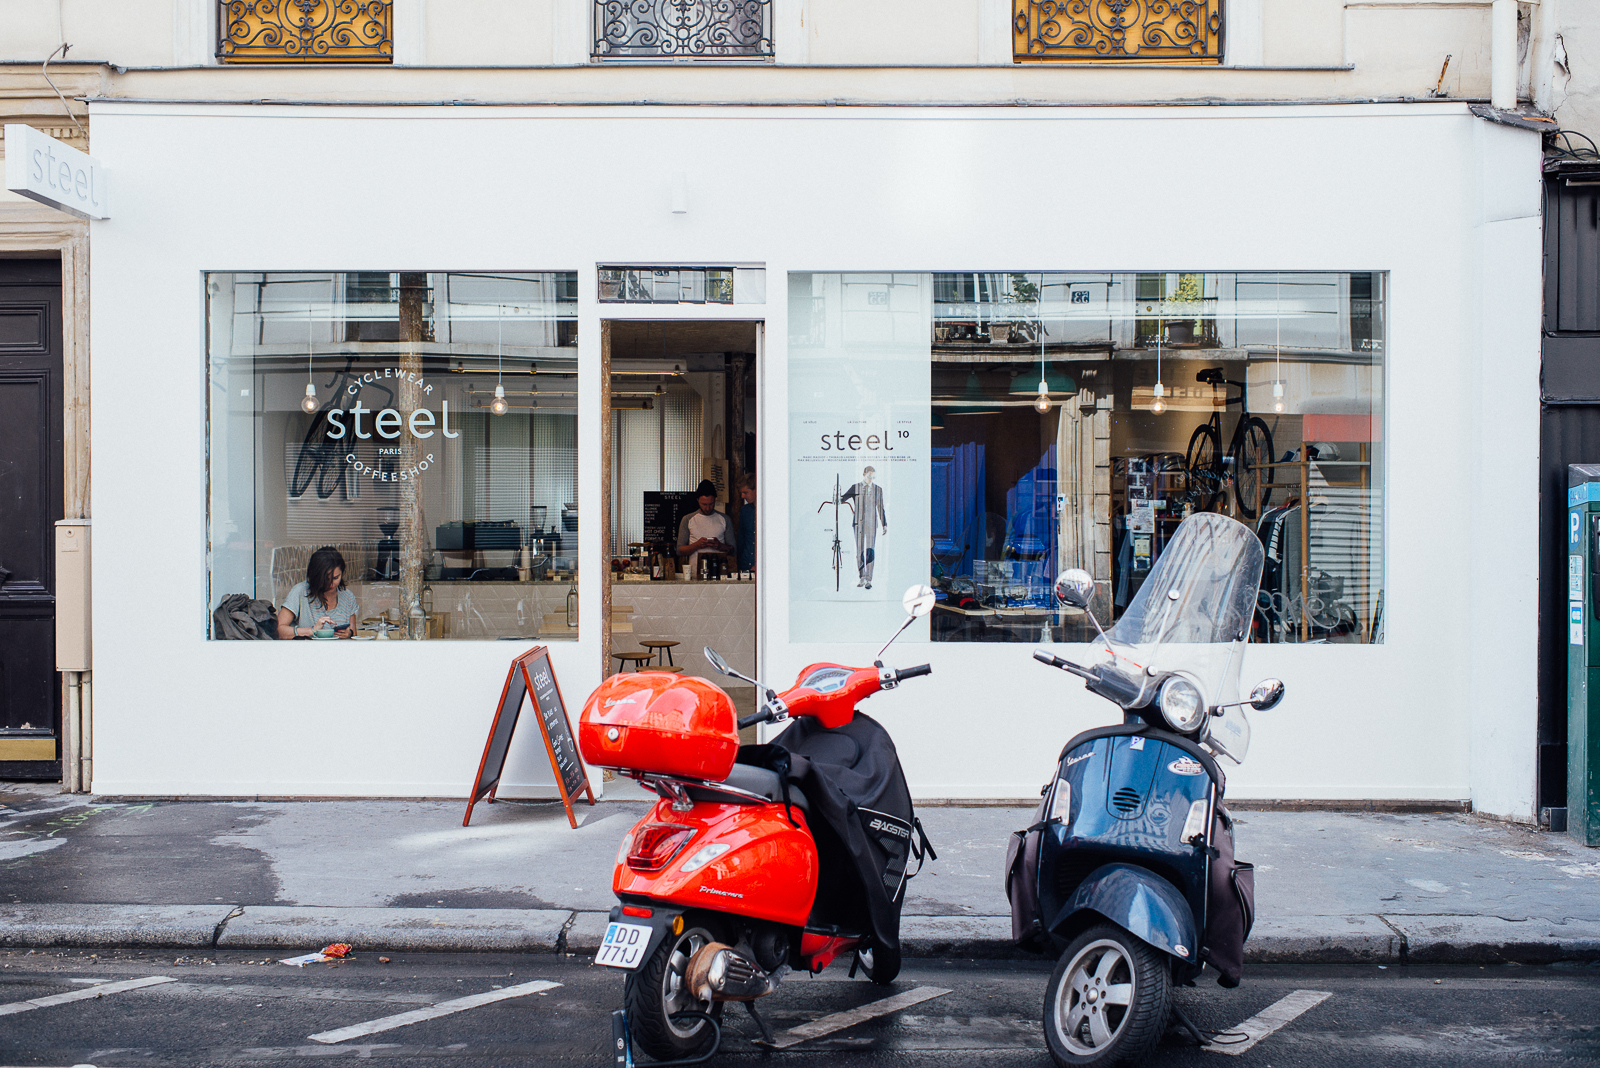 HiP Paris blog. Inside Steel. Street view.